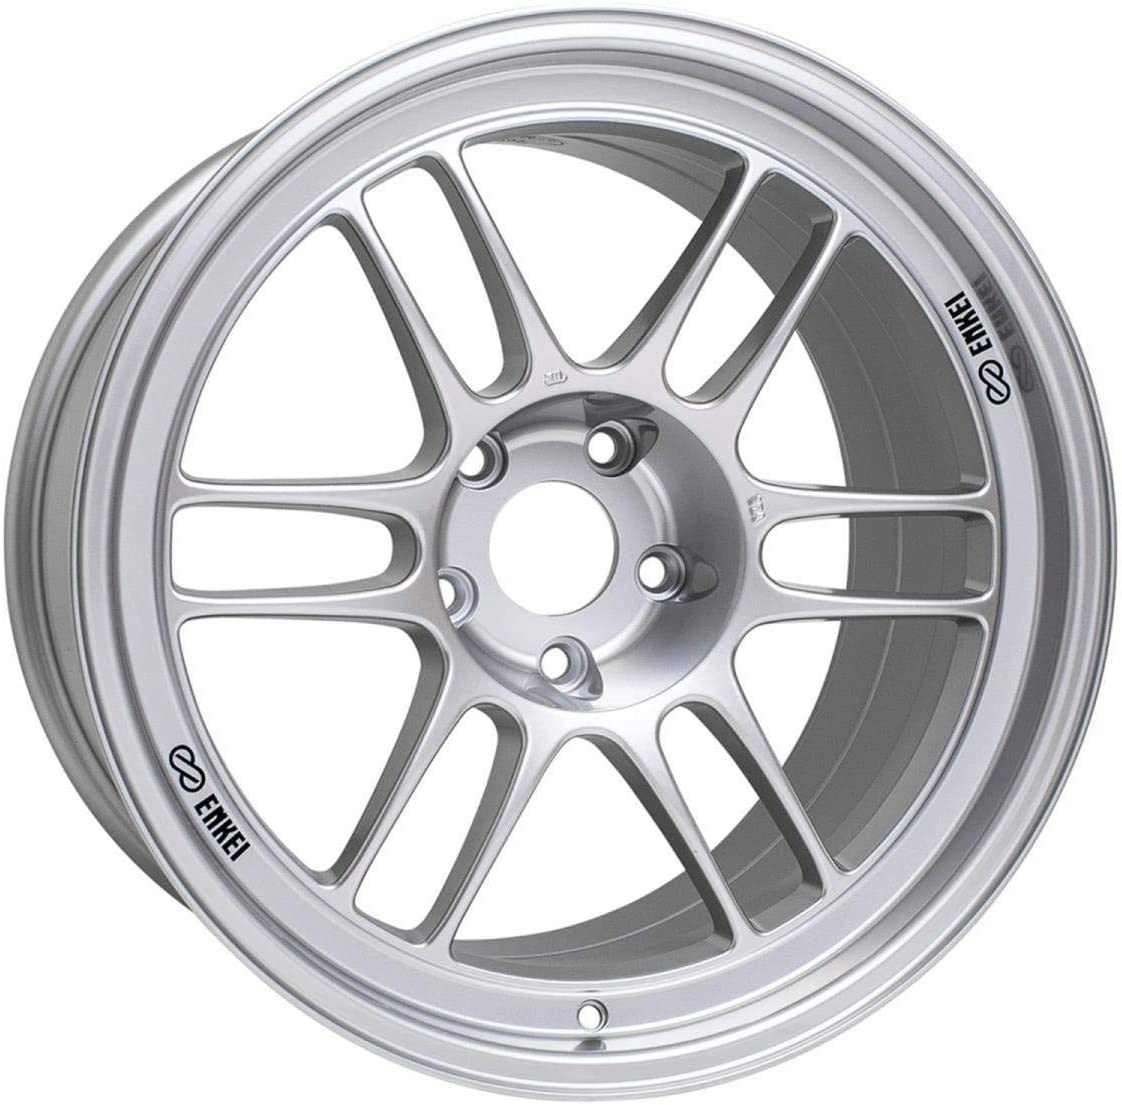 18x7.5 Enkei RPF1 (F1 Silver) Wheels/Rims 5x114.3 (3798756548SP)